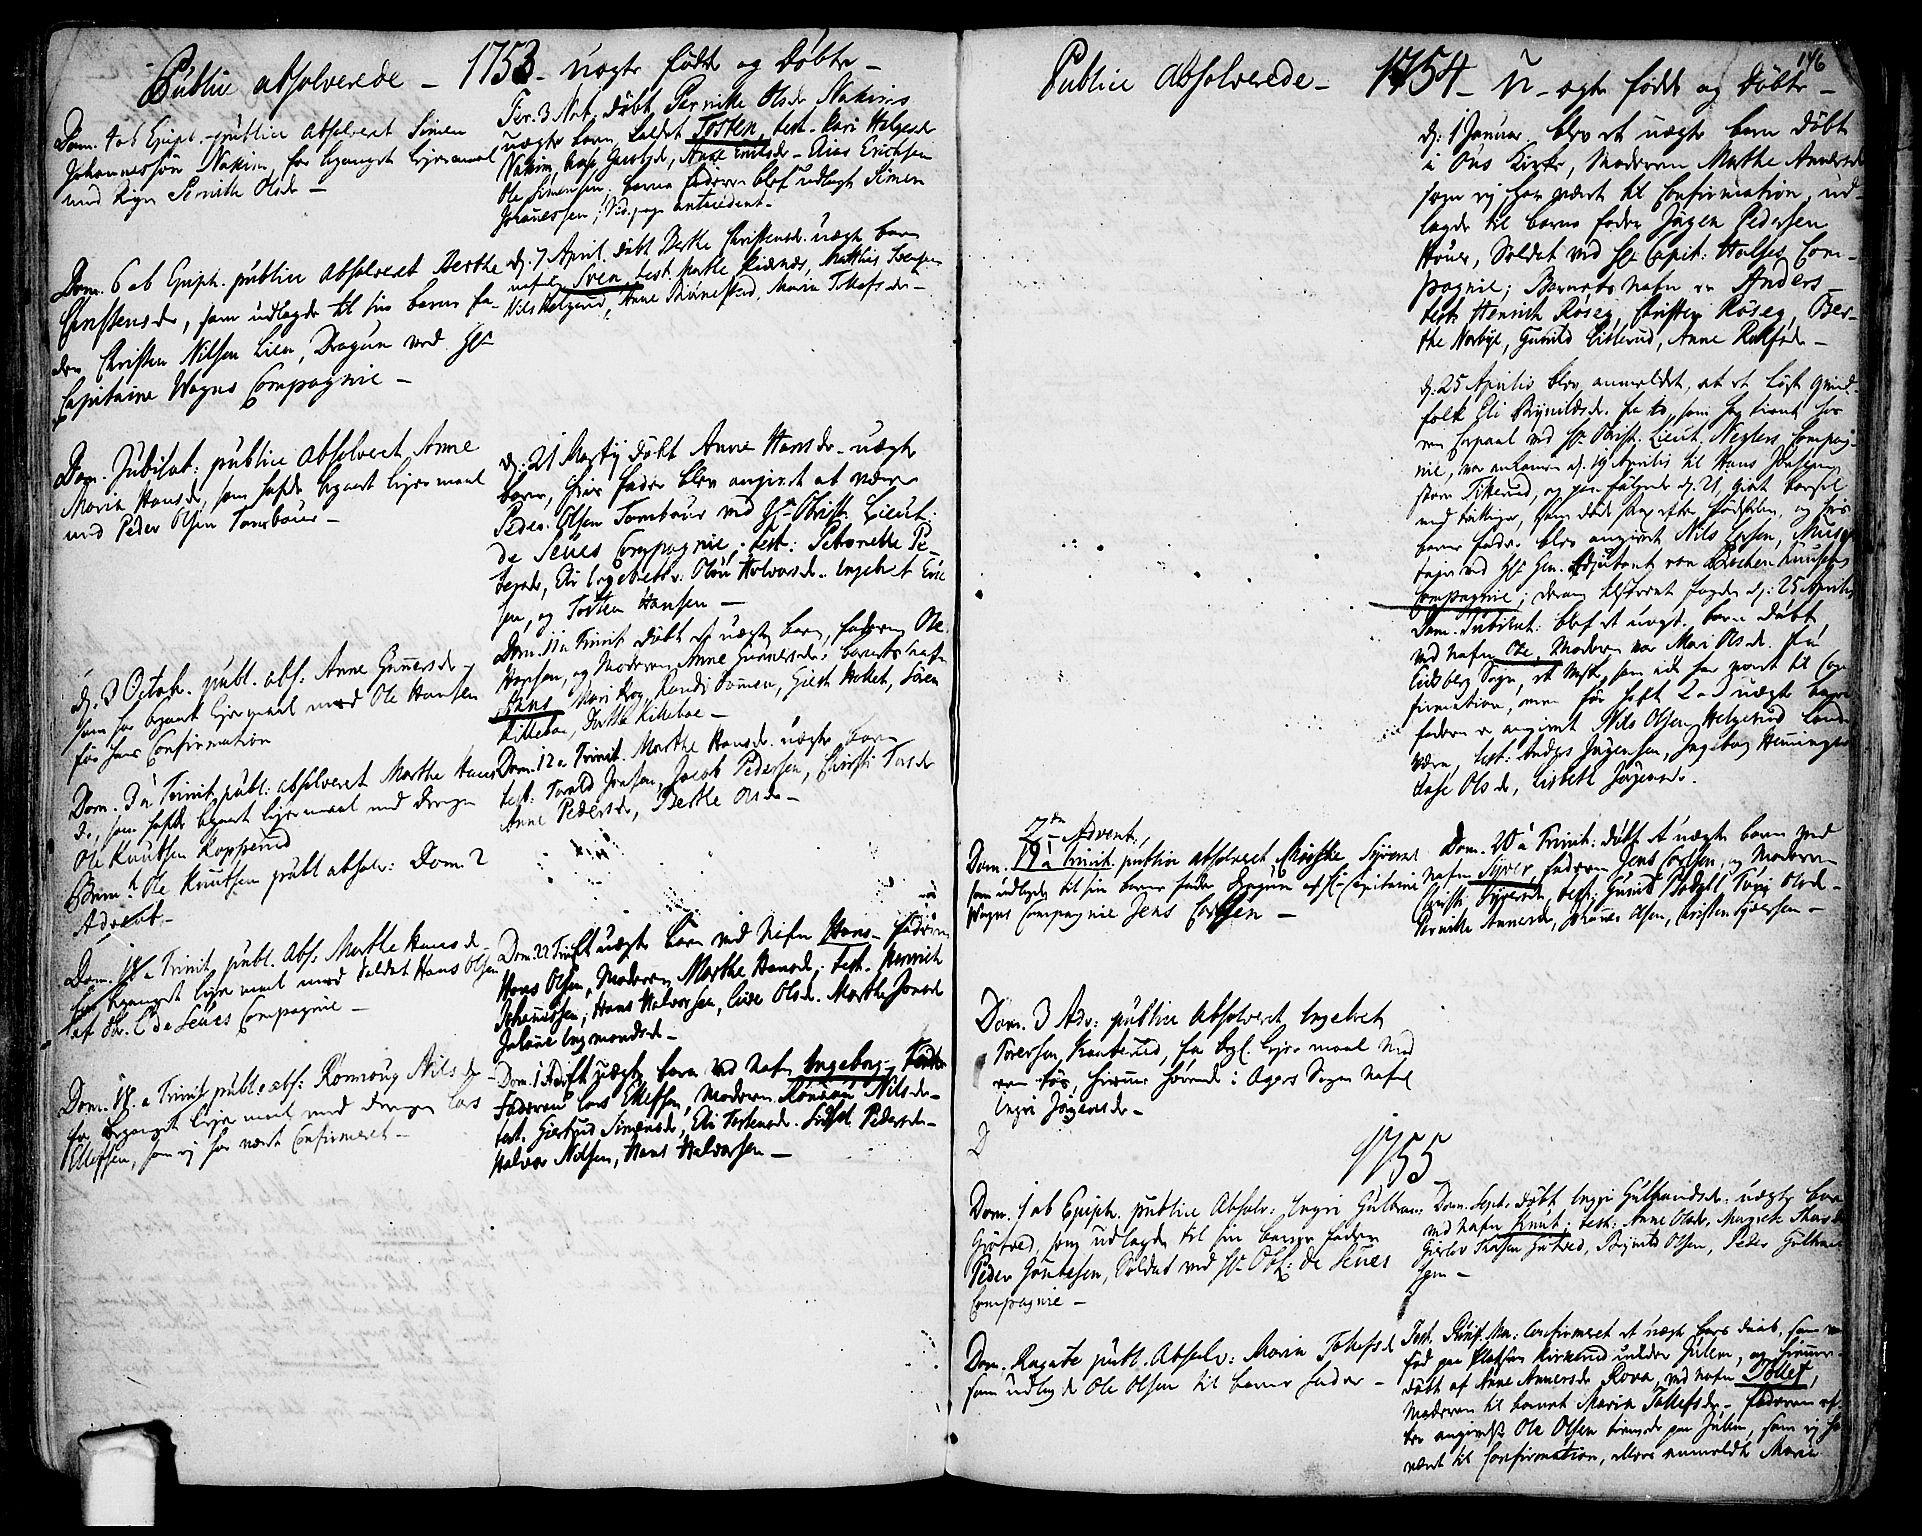 SAO, Rakkestad prestekontor Kirkebøker, F/Fa/L0003: Ministerialbok nr. I 3, 1752-1777, s. 146